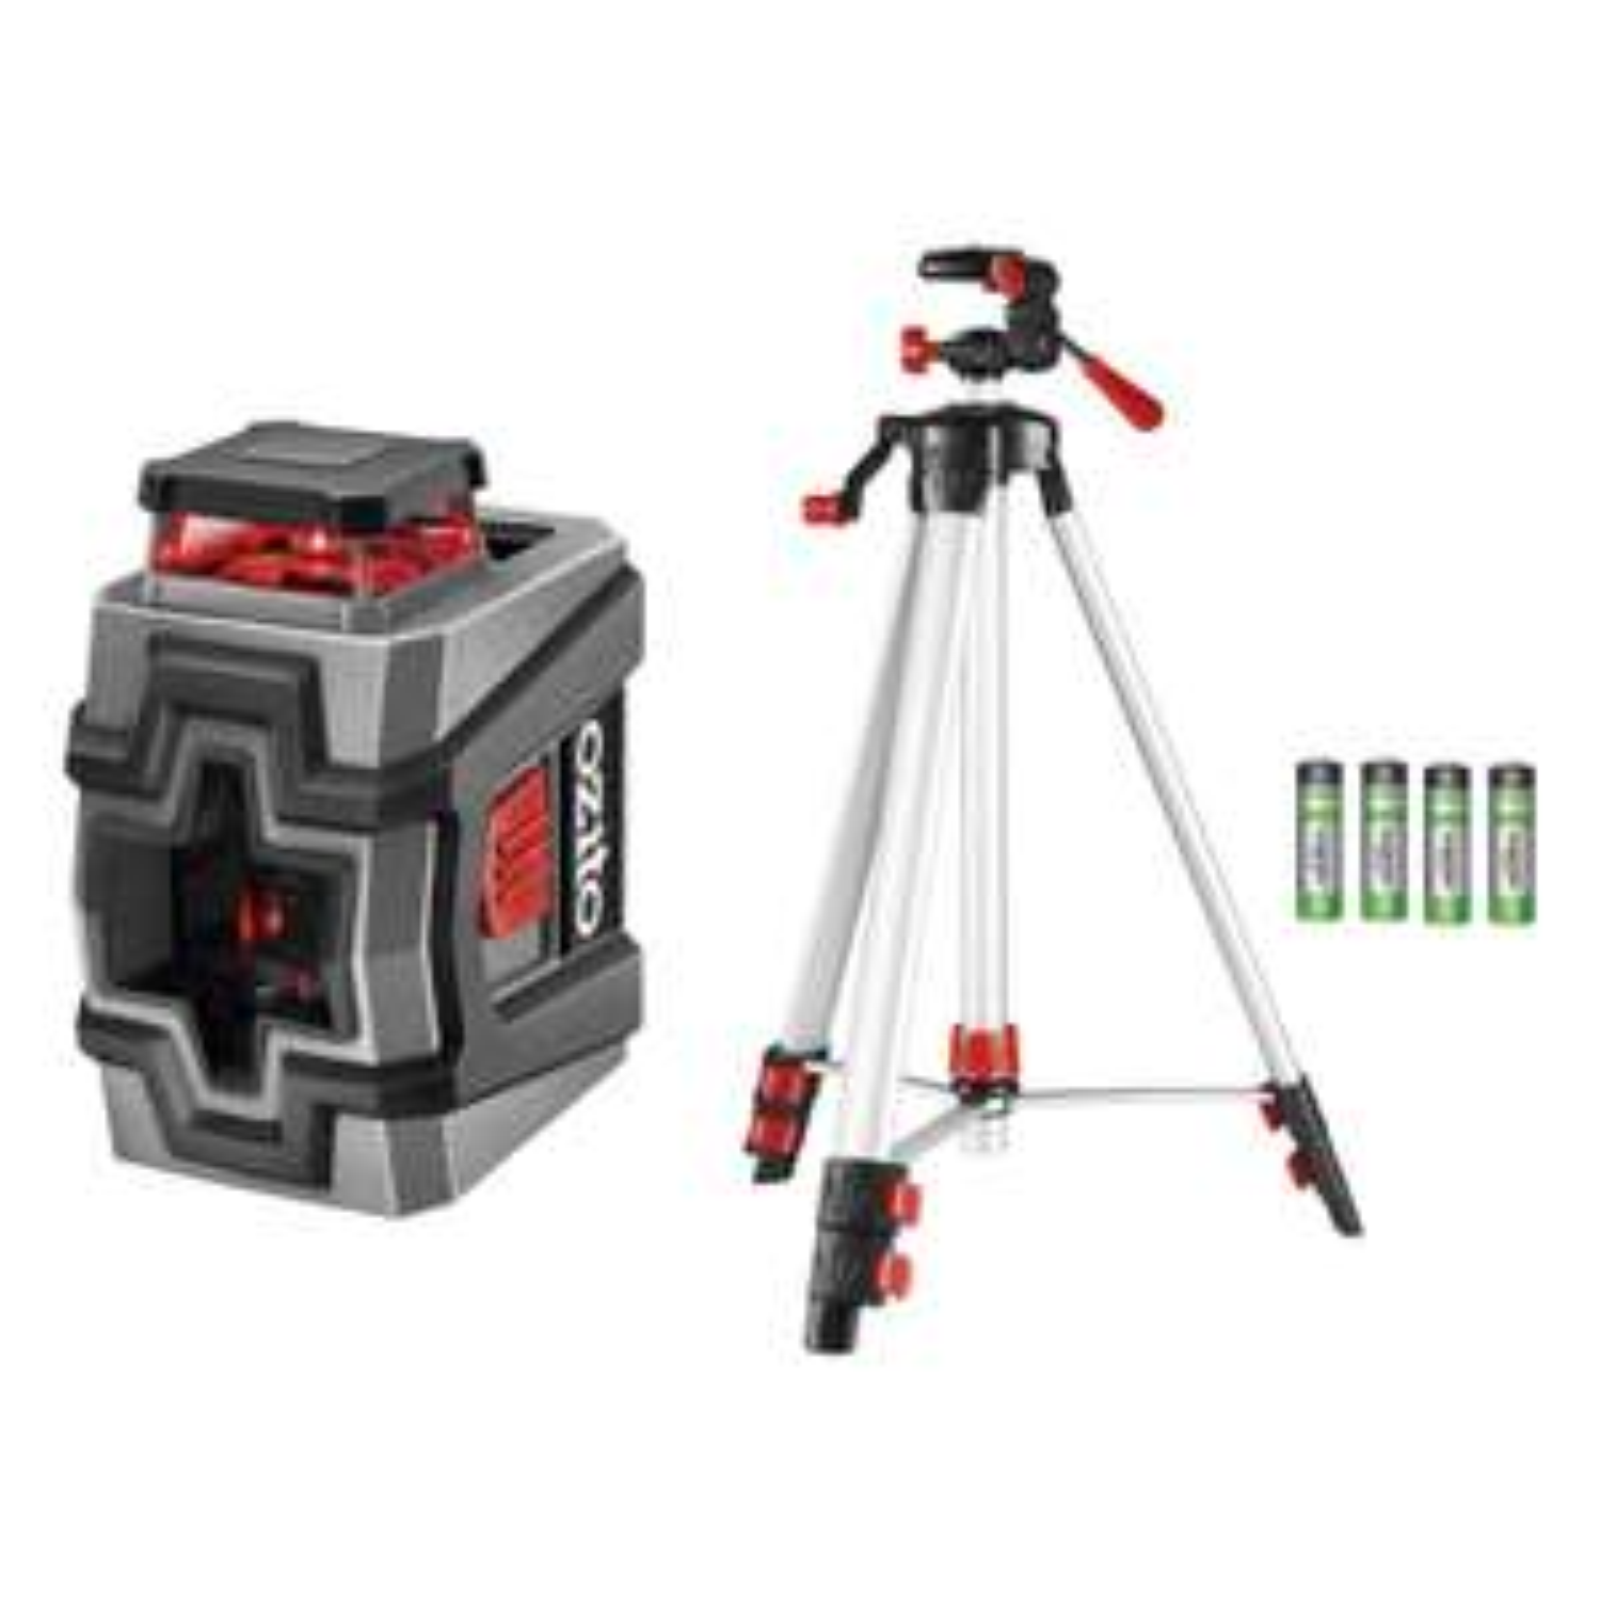 Homebase Ozito 360 Degree Line Laser with Tripod £27.50